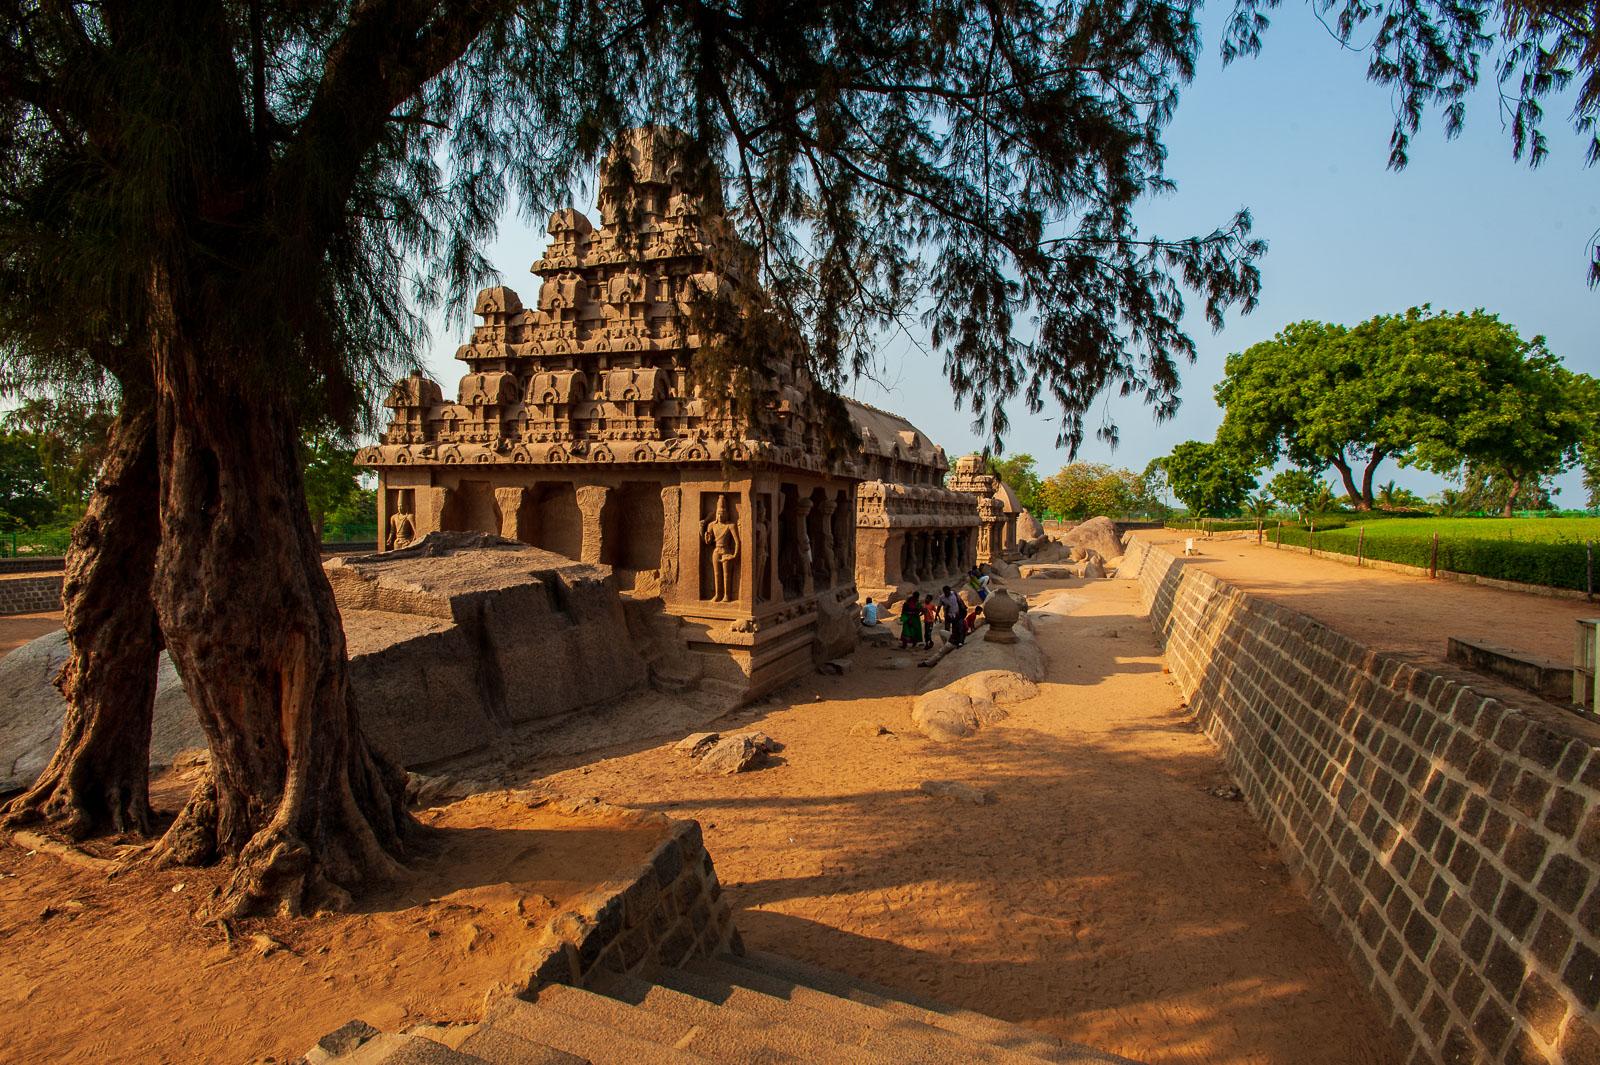 Stone Temple, Mamallapuram